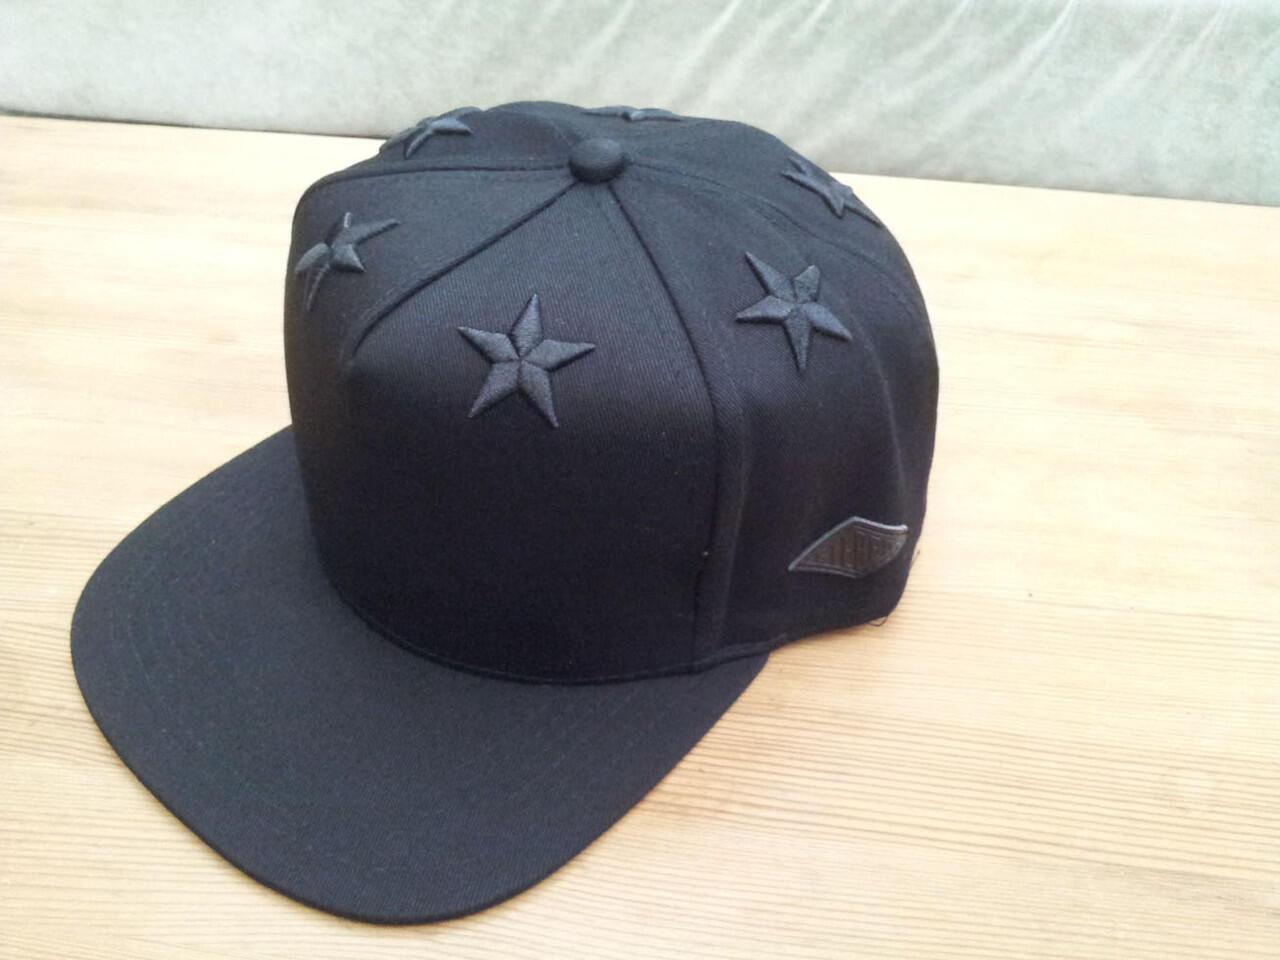 STEREO SIX STARS SNAPBACK SSSSS Classic Stealth (Black/Black)